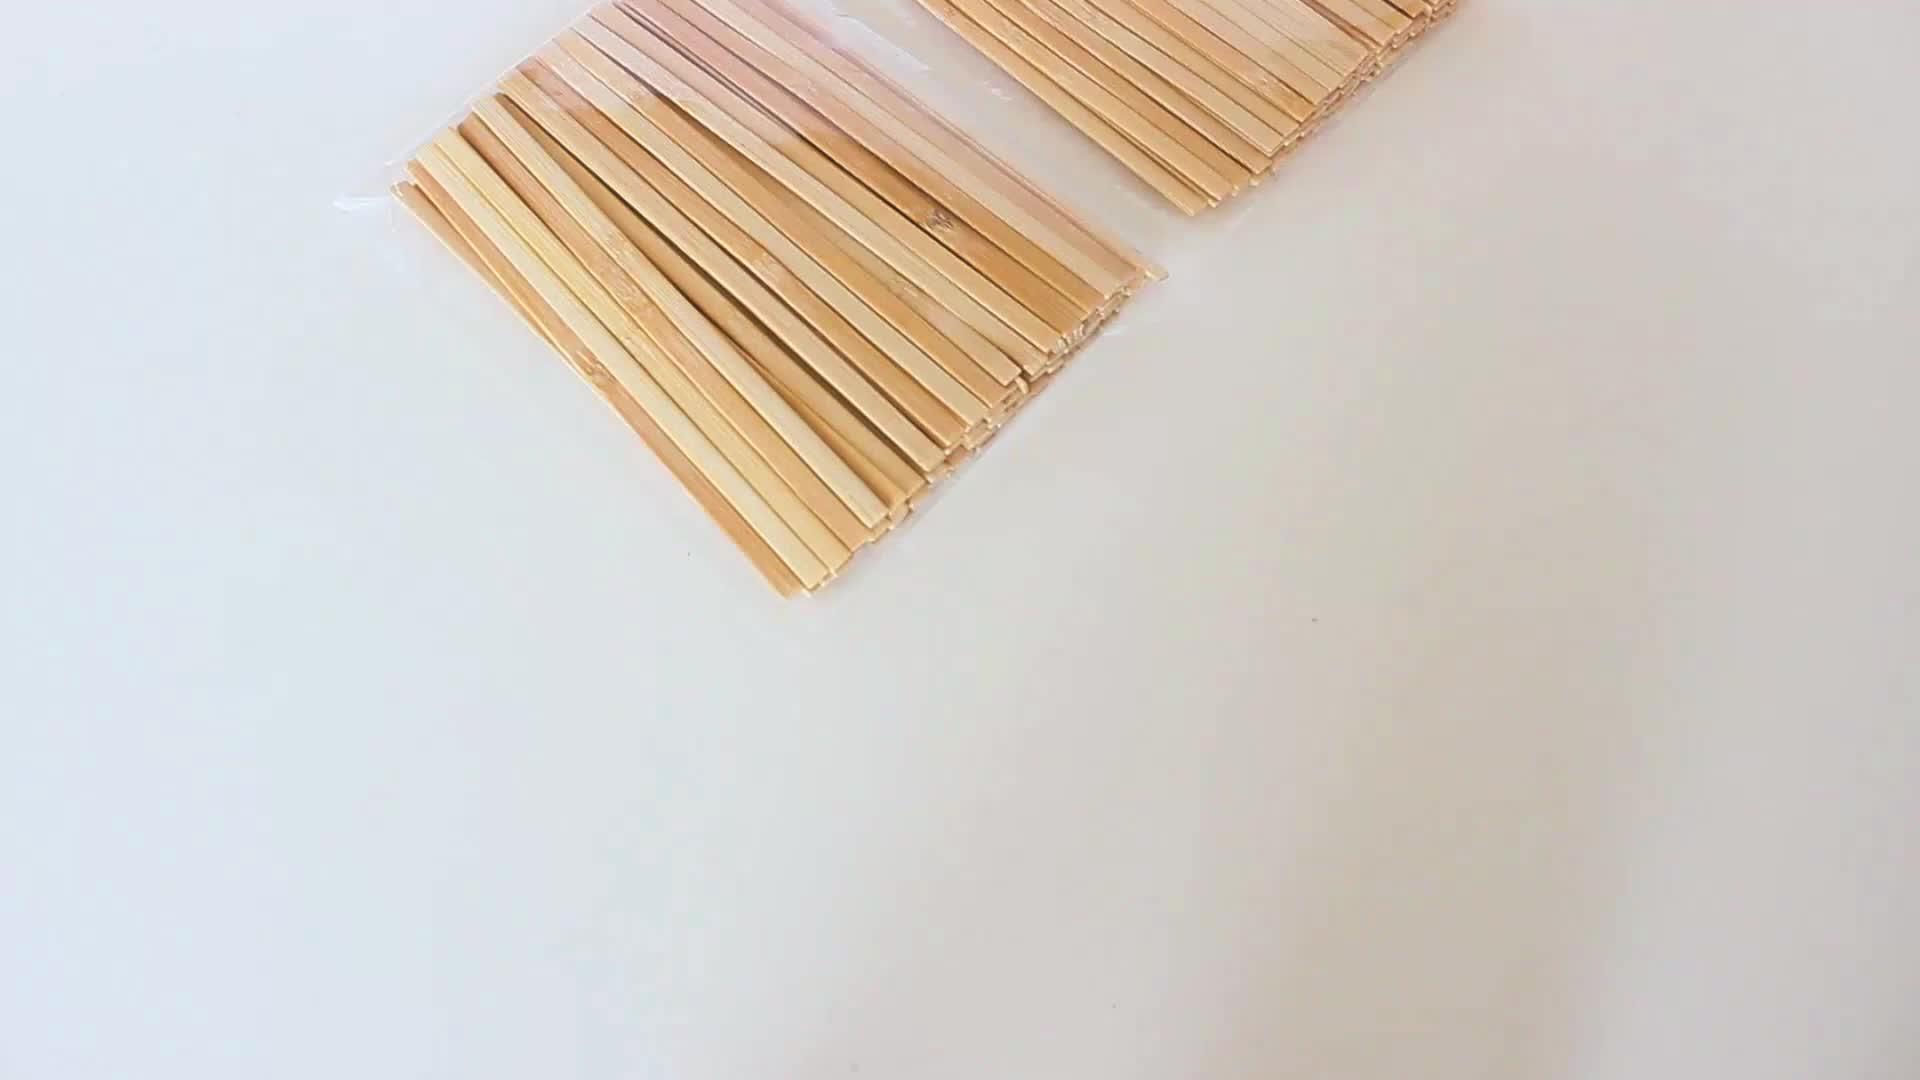 Fornitore della cina di legno usa e getta di bambù tazza di caffè agitatore di zucchero tè stir sticks